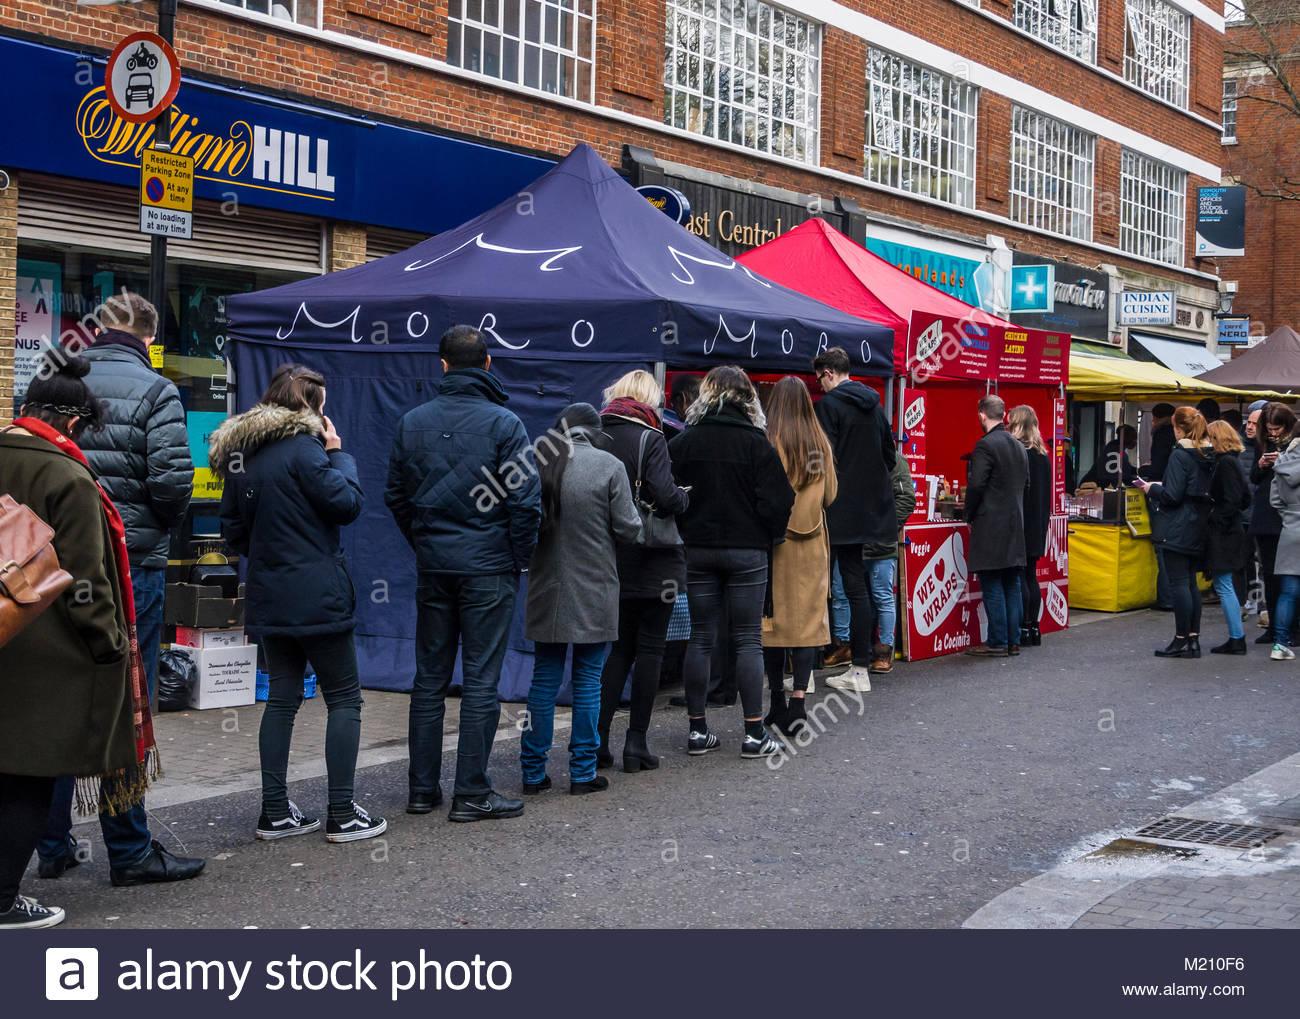 Exmouth Markt Stadt London England Großbritannien Stockbild